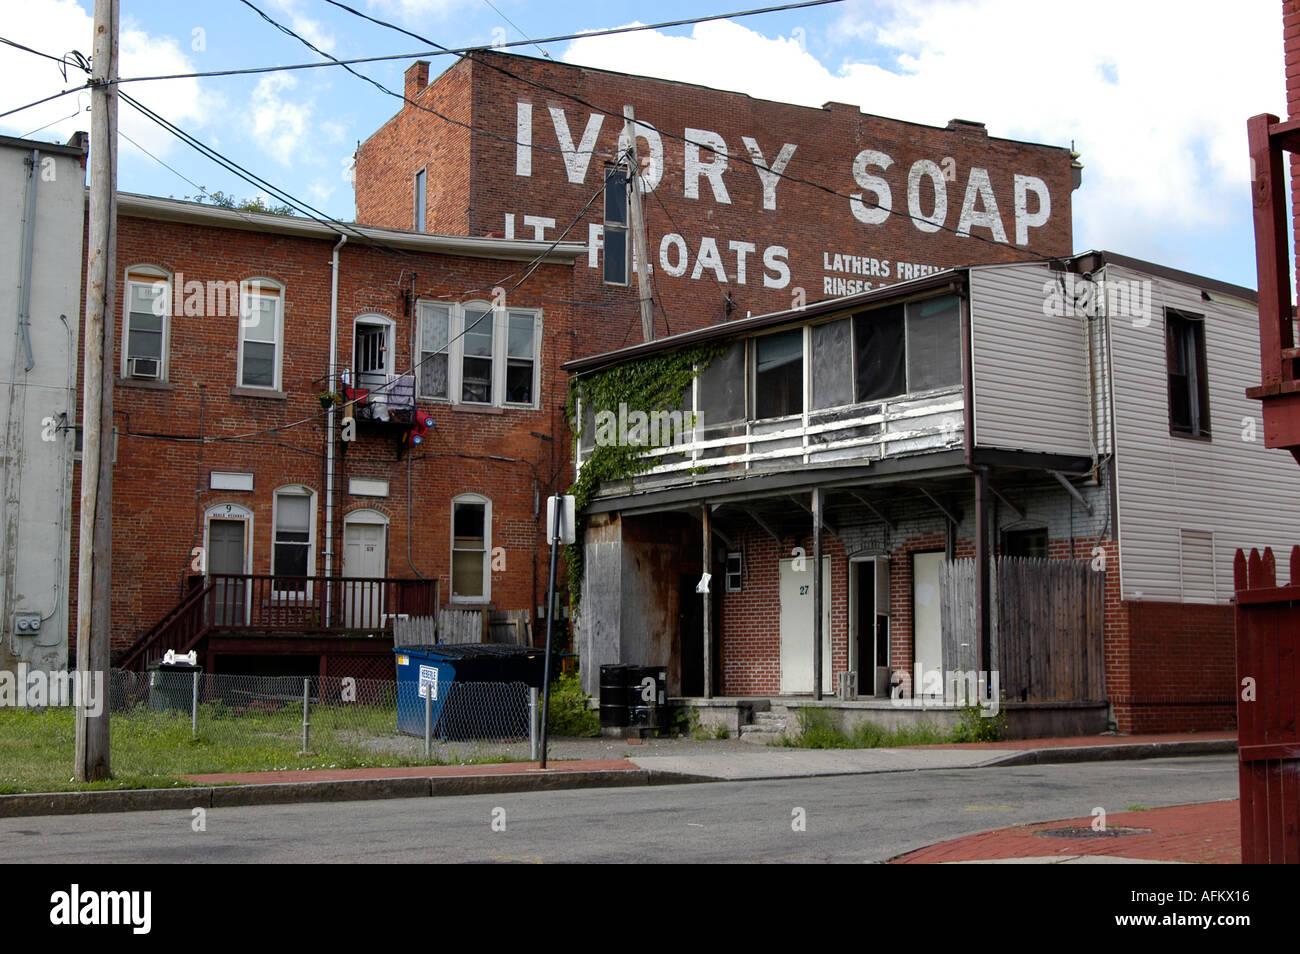 Ivory Soap Stockfotos & Ivory Soap Bilder - Alamy